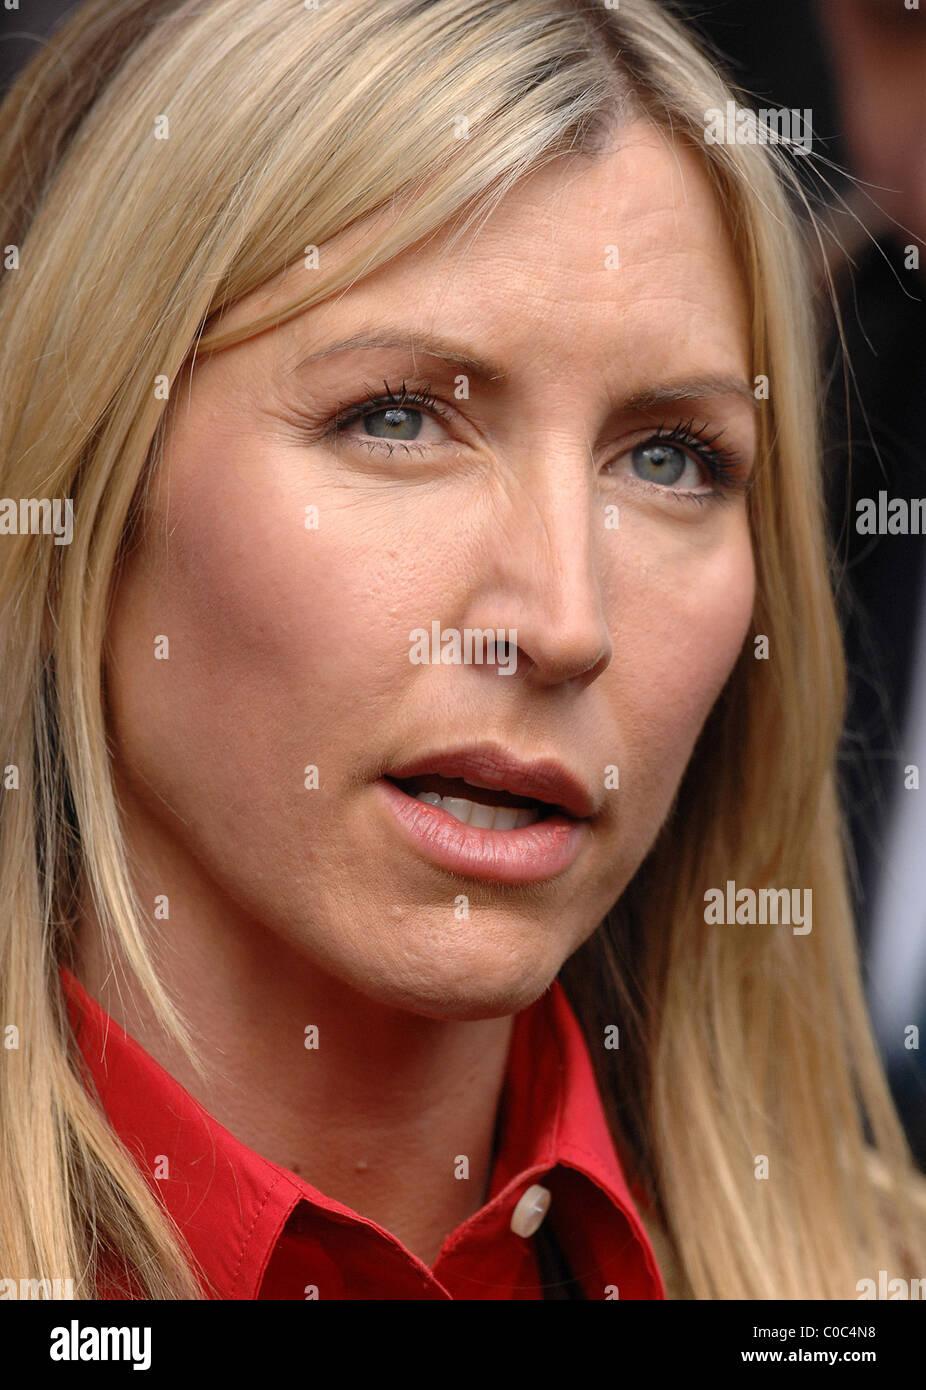 Paul McCartney Has New Locks, Heather Mills Has Old Keys new images